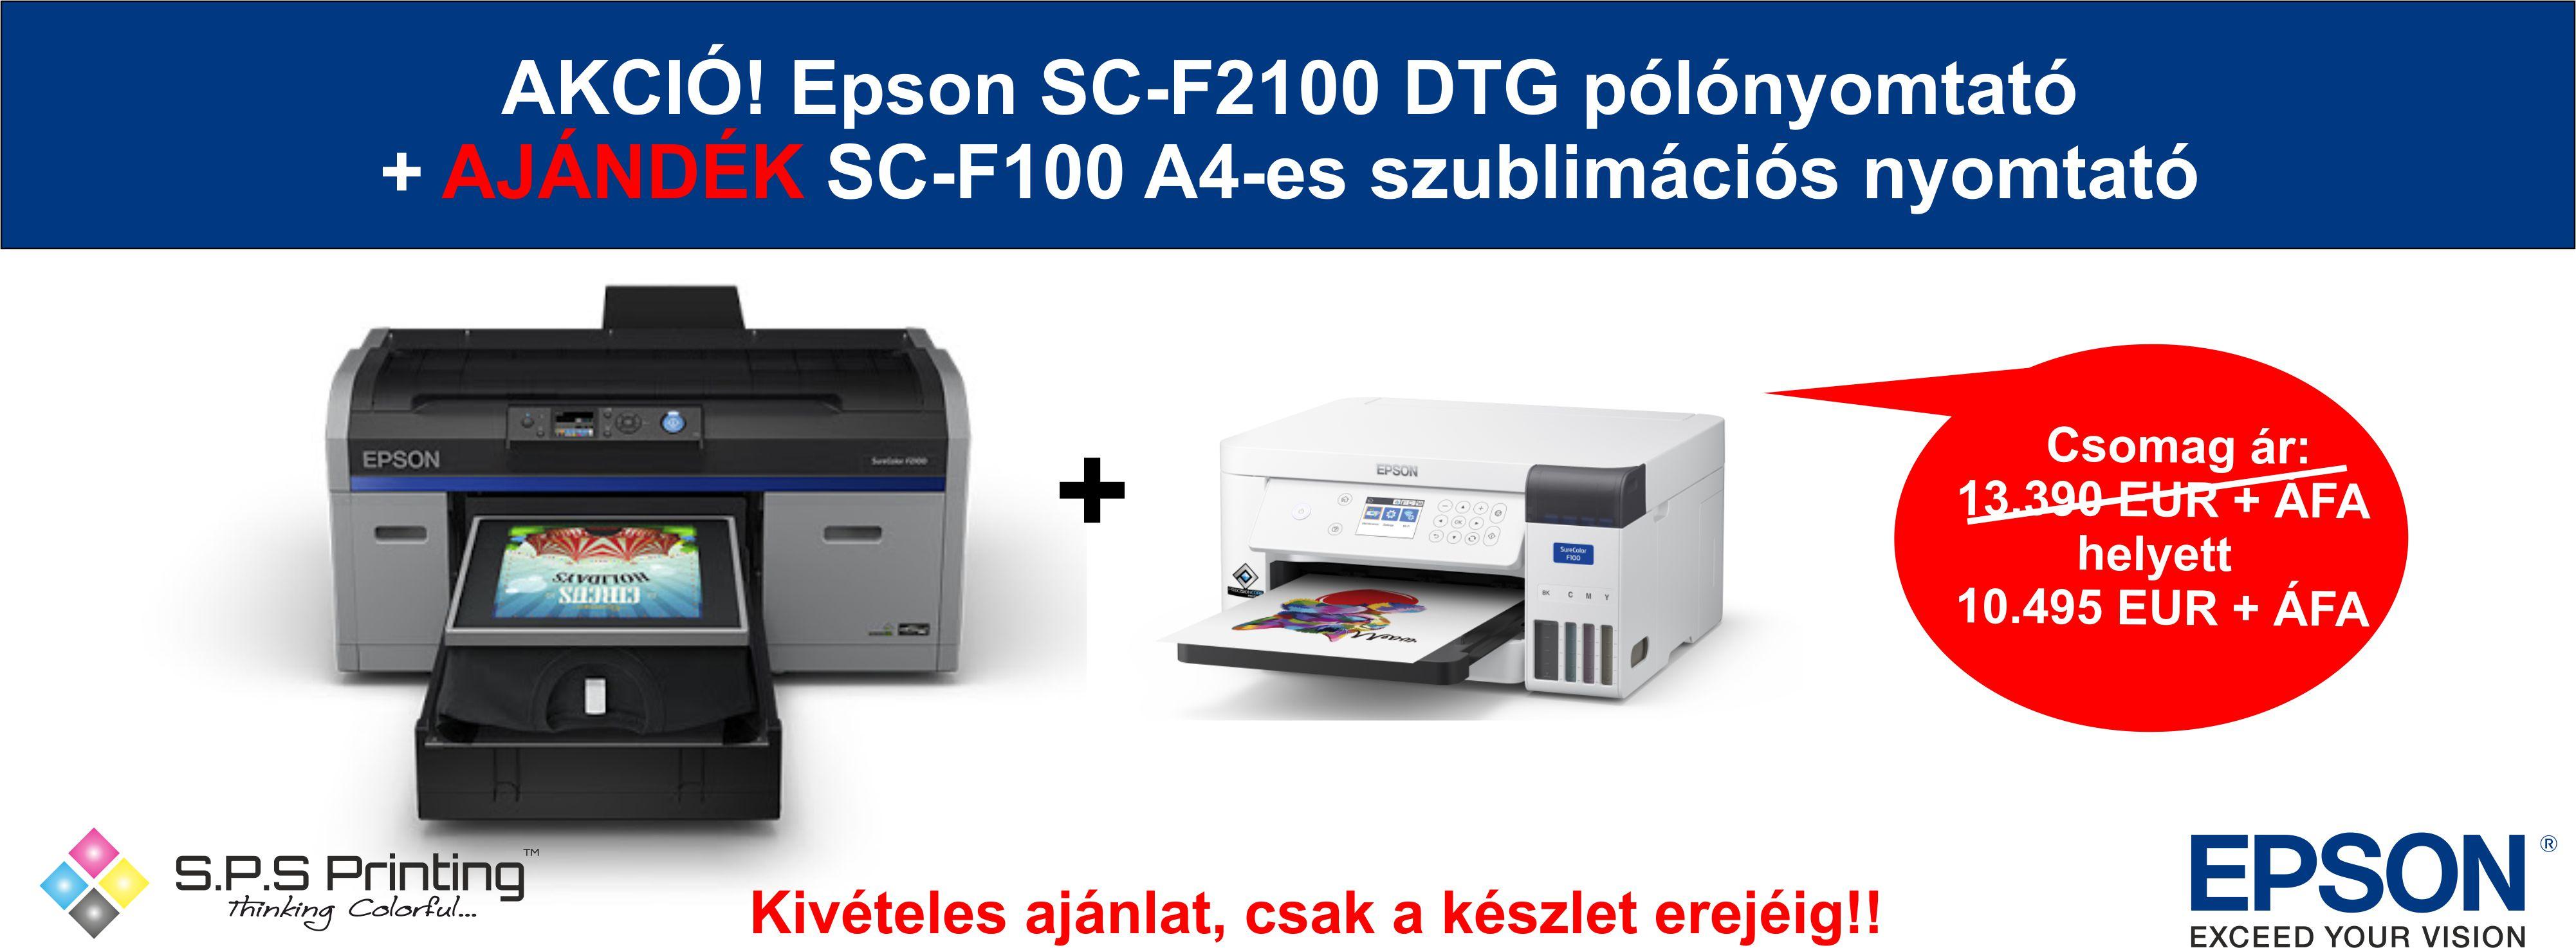 Epson SC-F2100 + SC-F100 AKCIÓ!